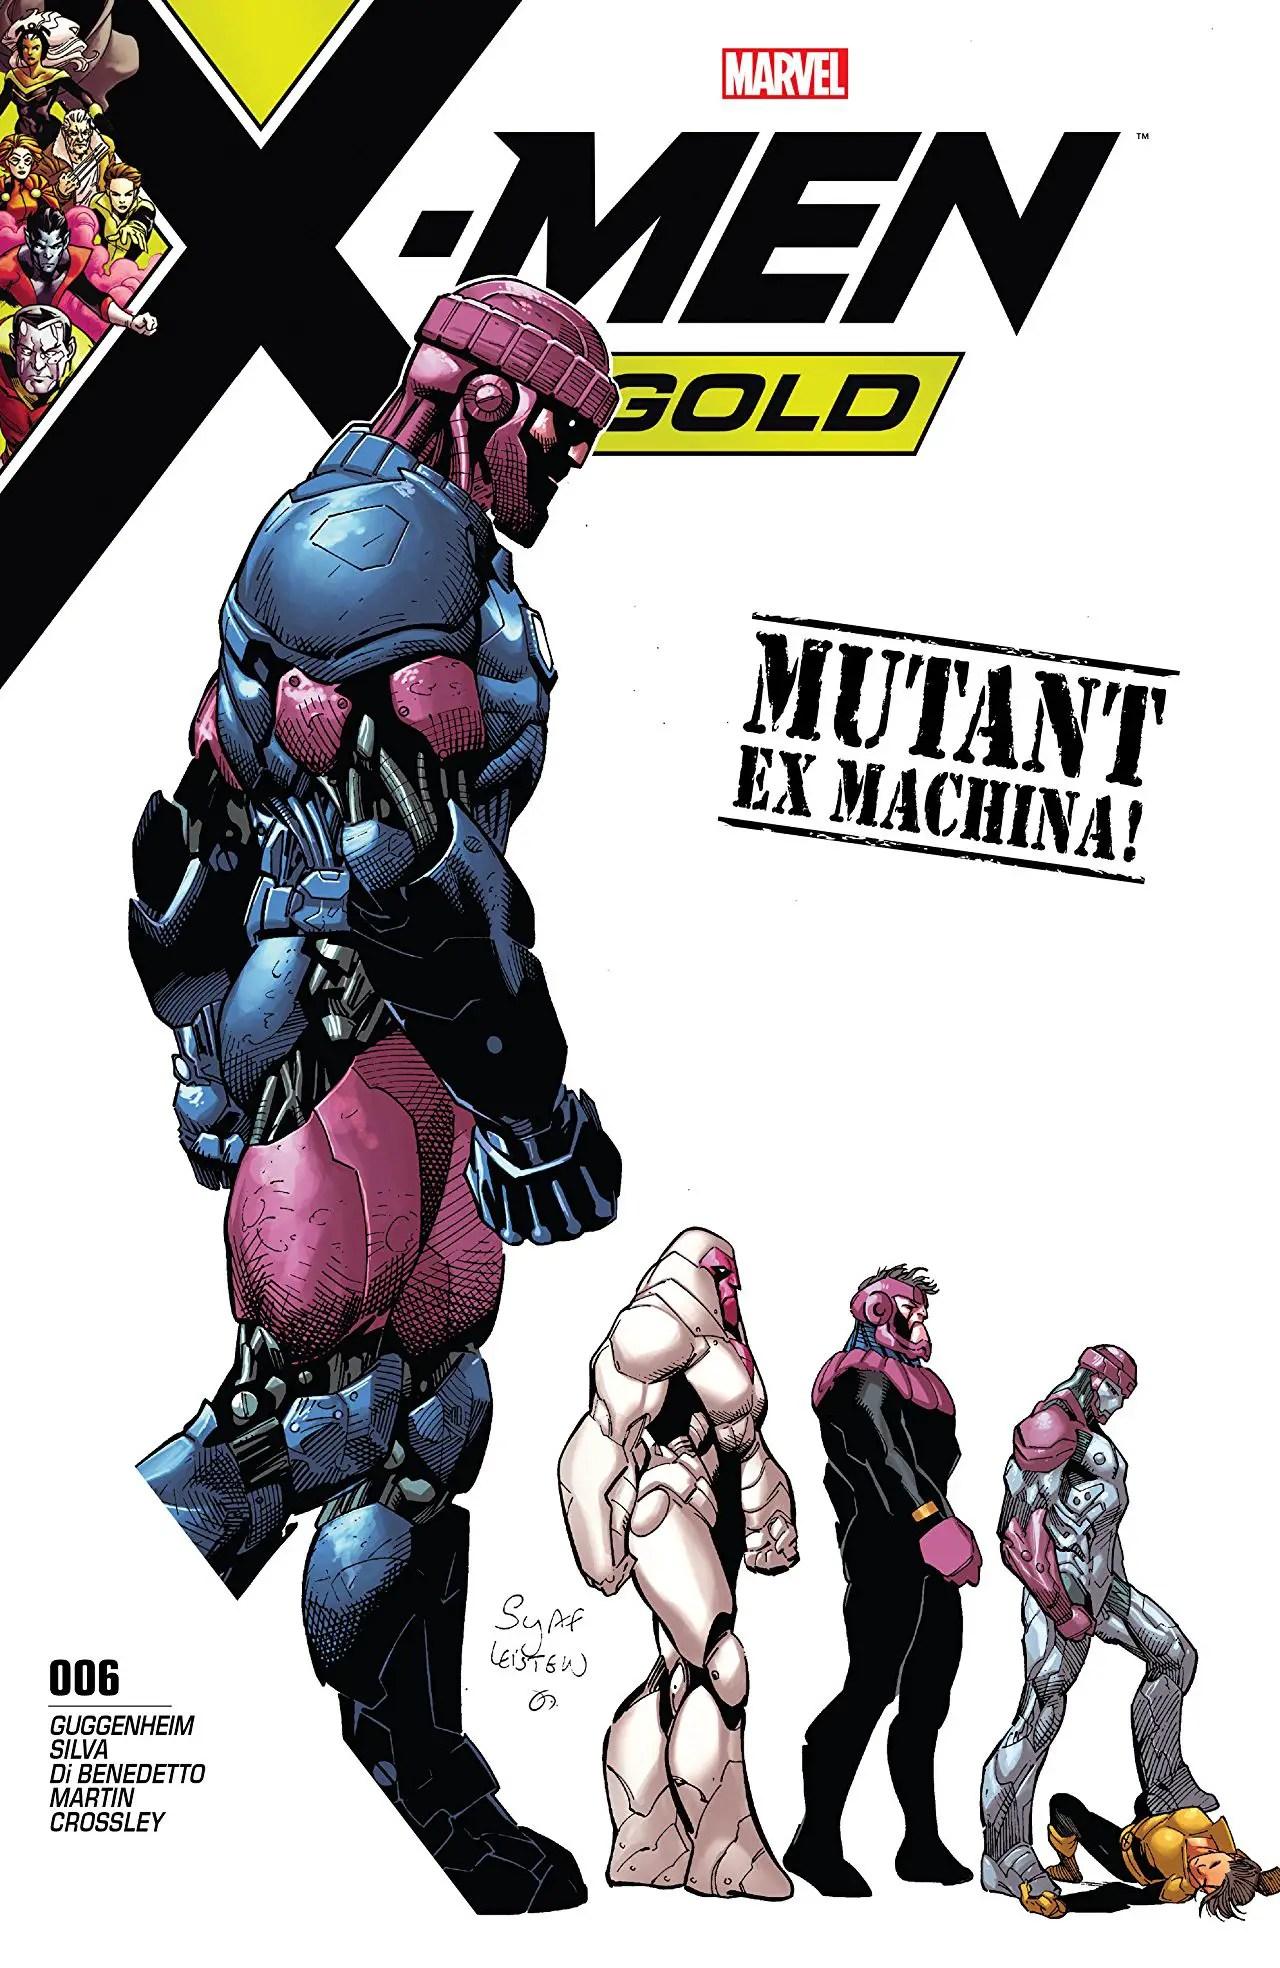 X-Men: Gold #6 Review